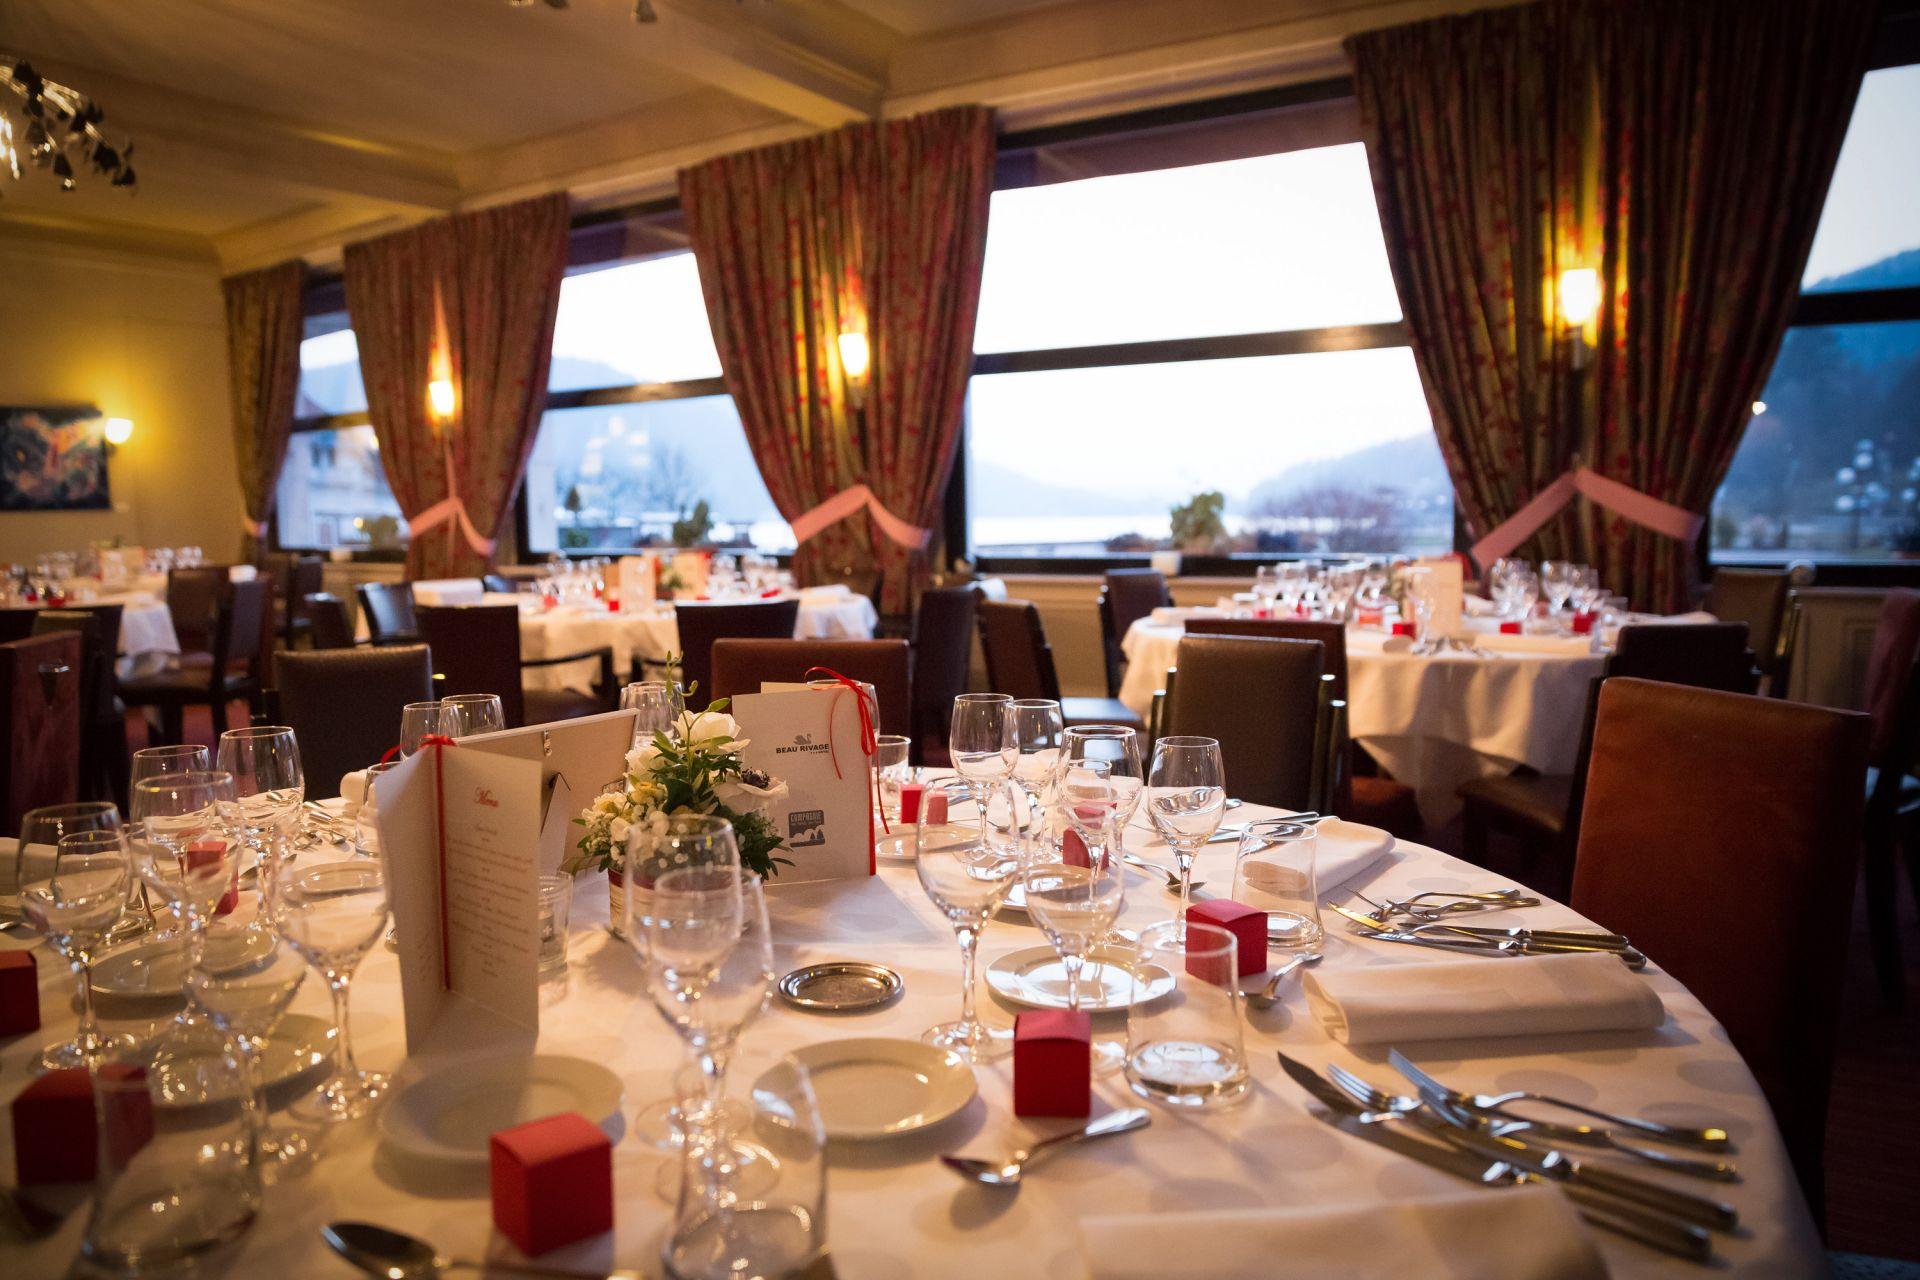 Restaurant cote lac gerardmer lorraine tourisme - Restaurant cote jardin lac 2 ...